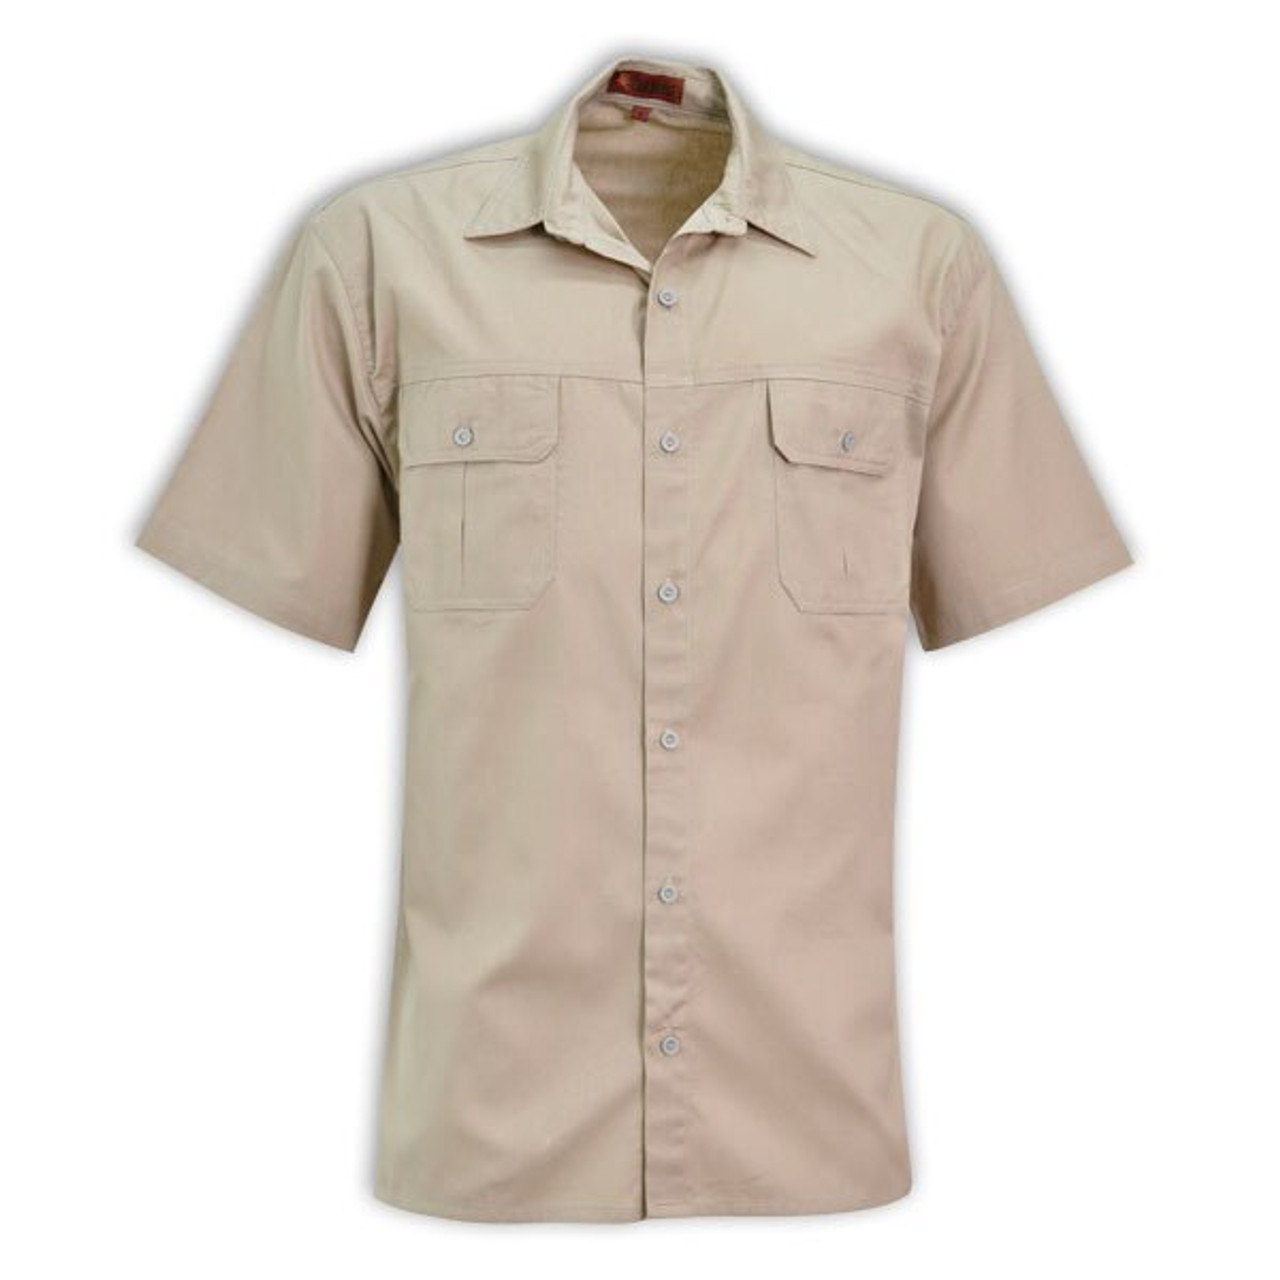 bush shirts suppliers